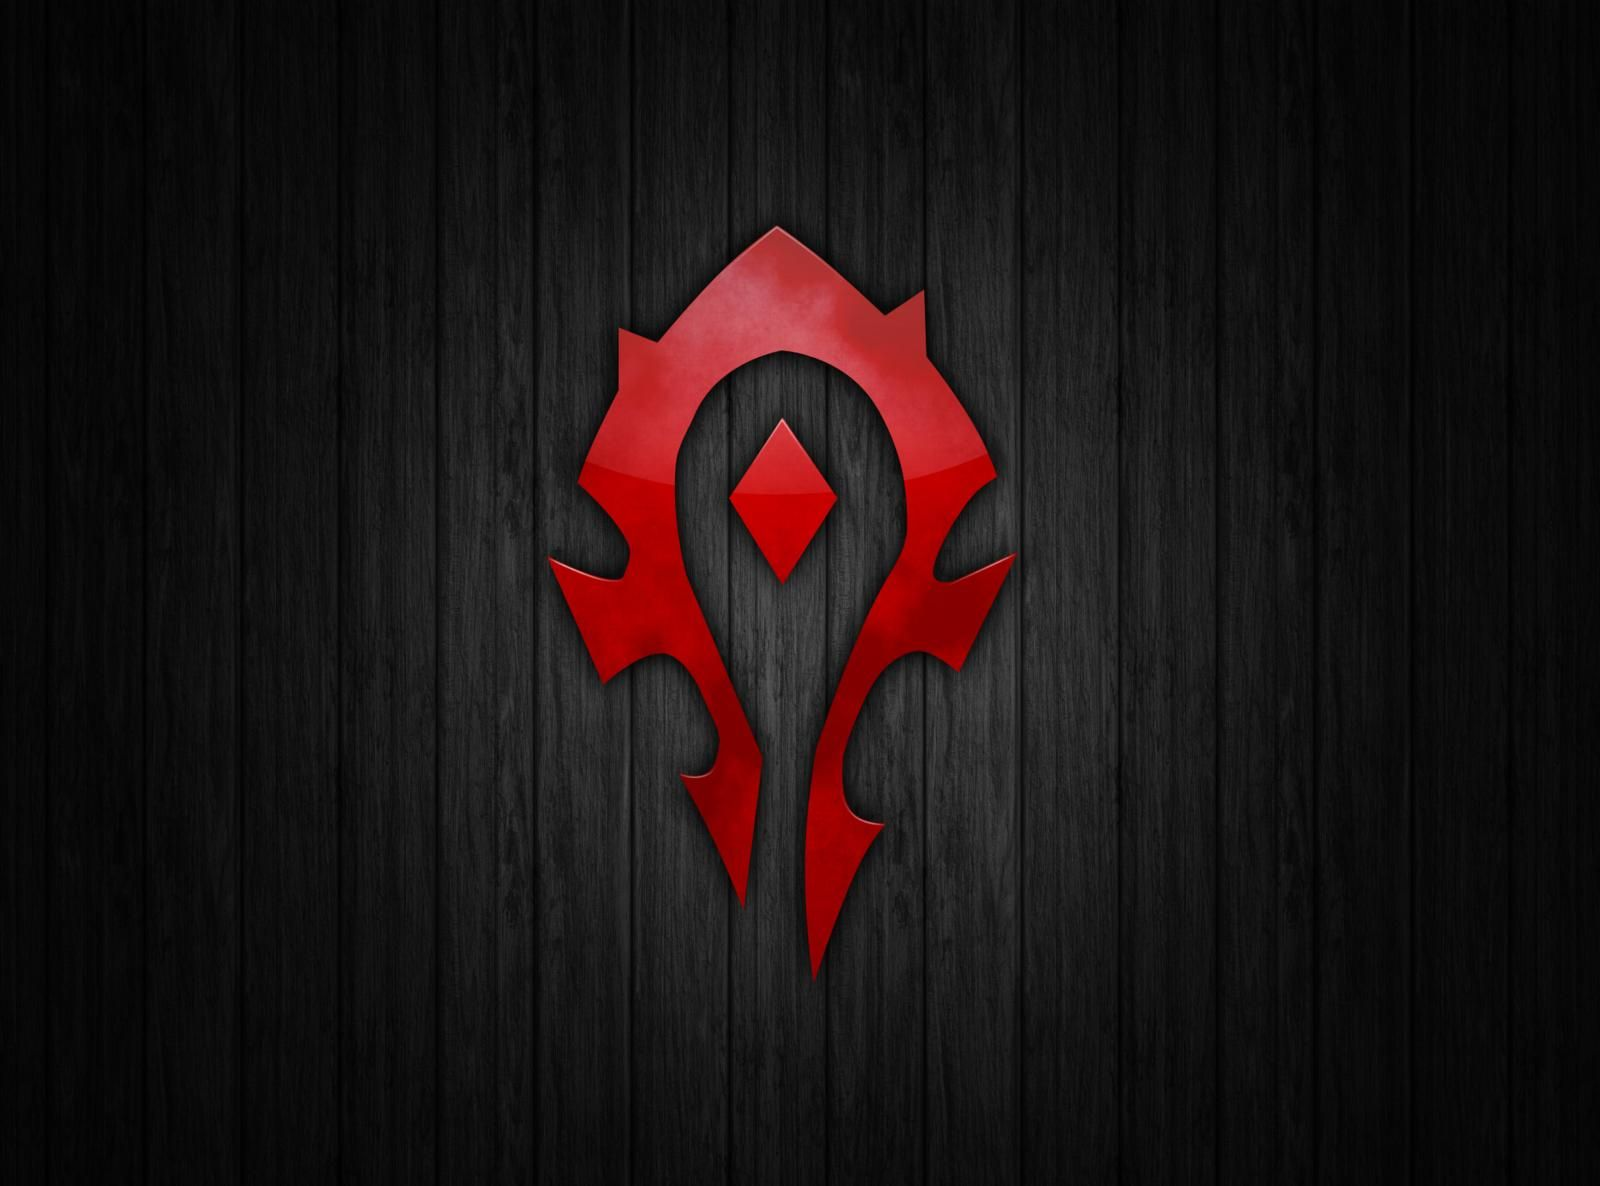 Horde Logo Wallpapers World Of Warcraft Wallpaper Horde Computer Wallpaper